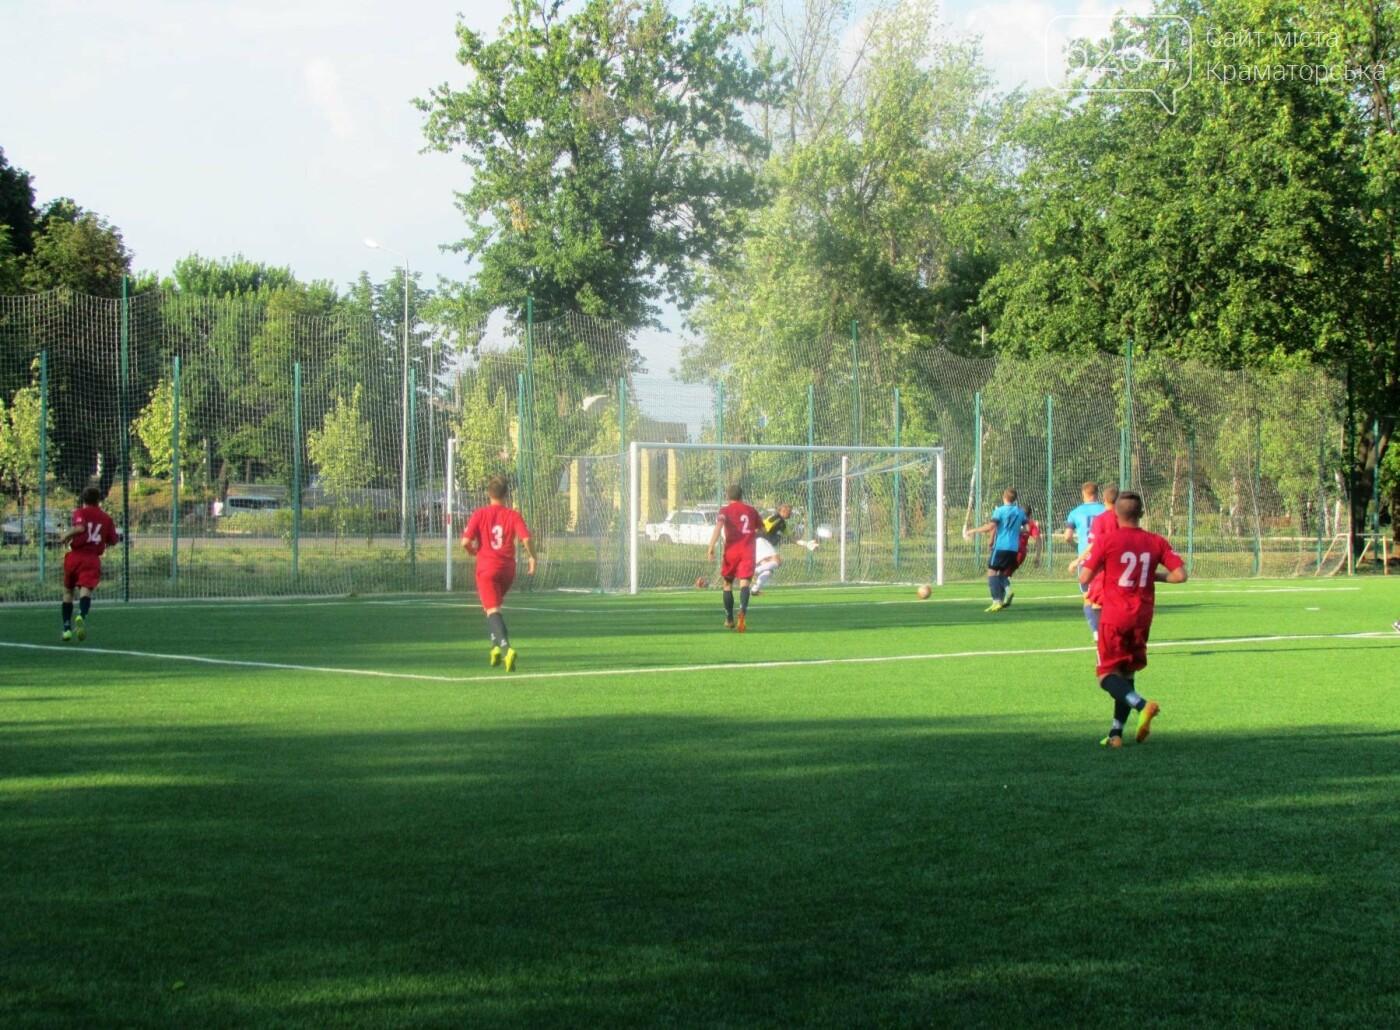 Полуфинал Кубка области по футболу прошел в Краматорске, фото-4